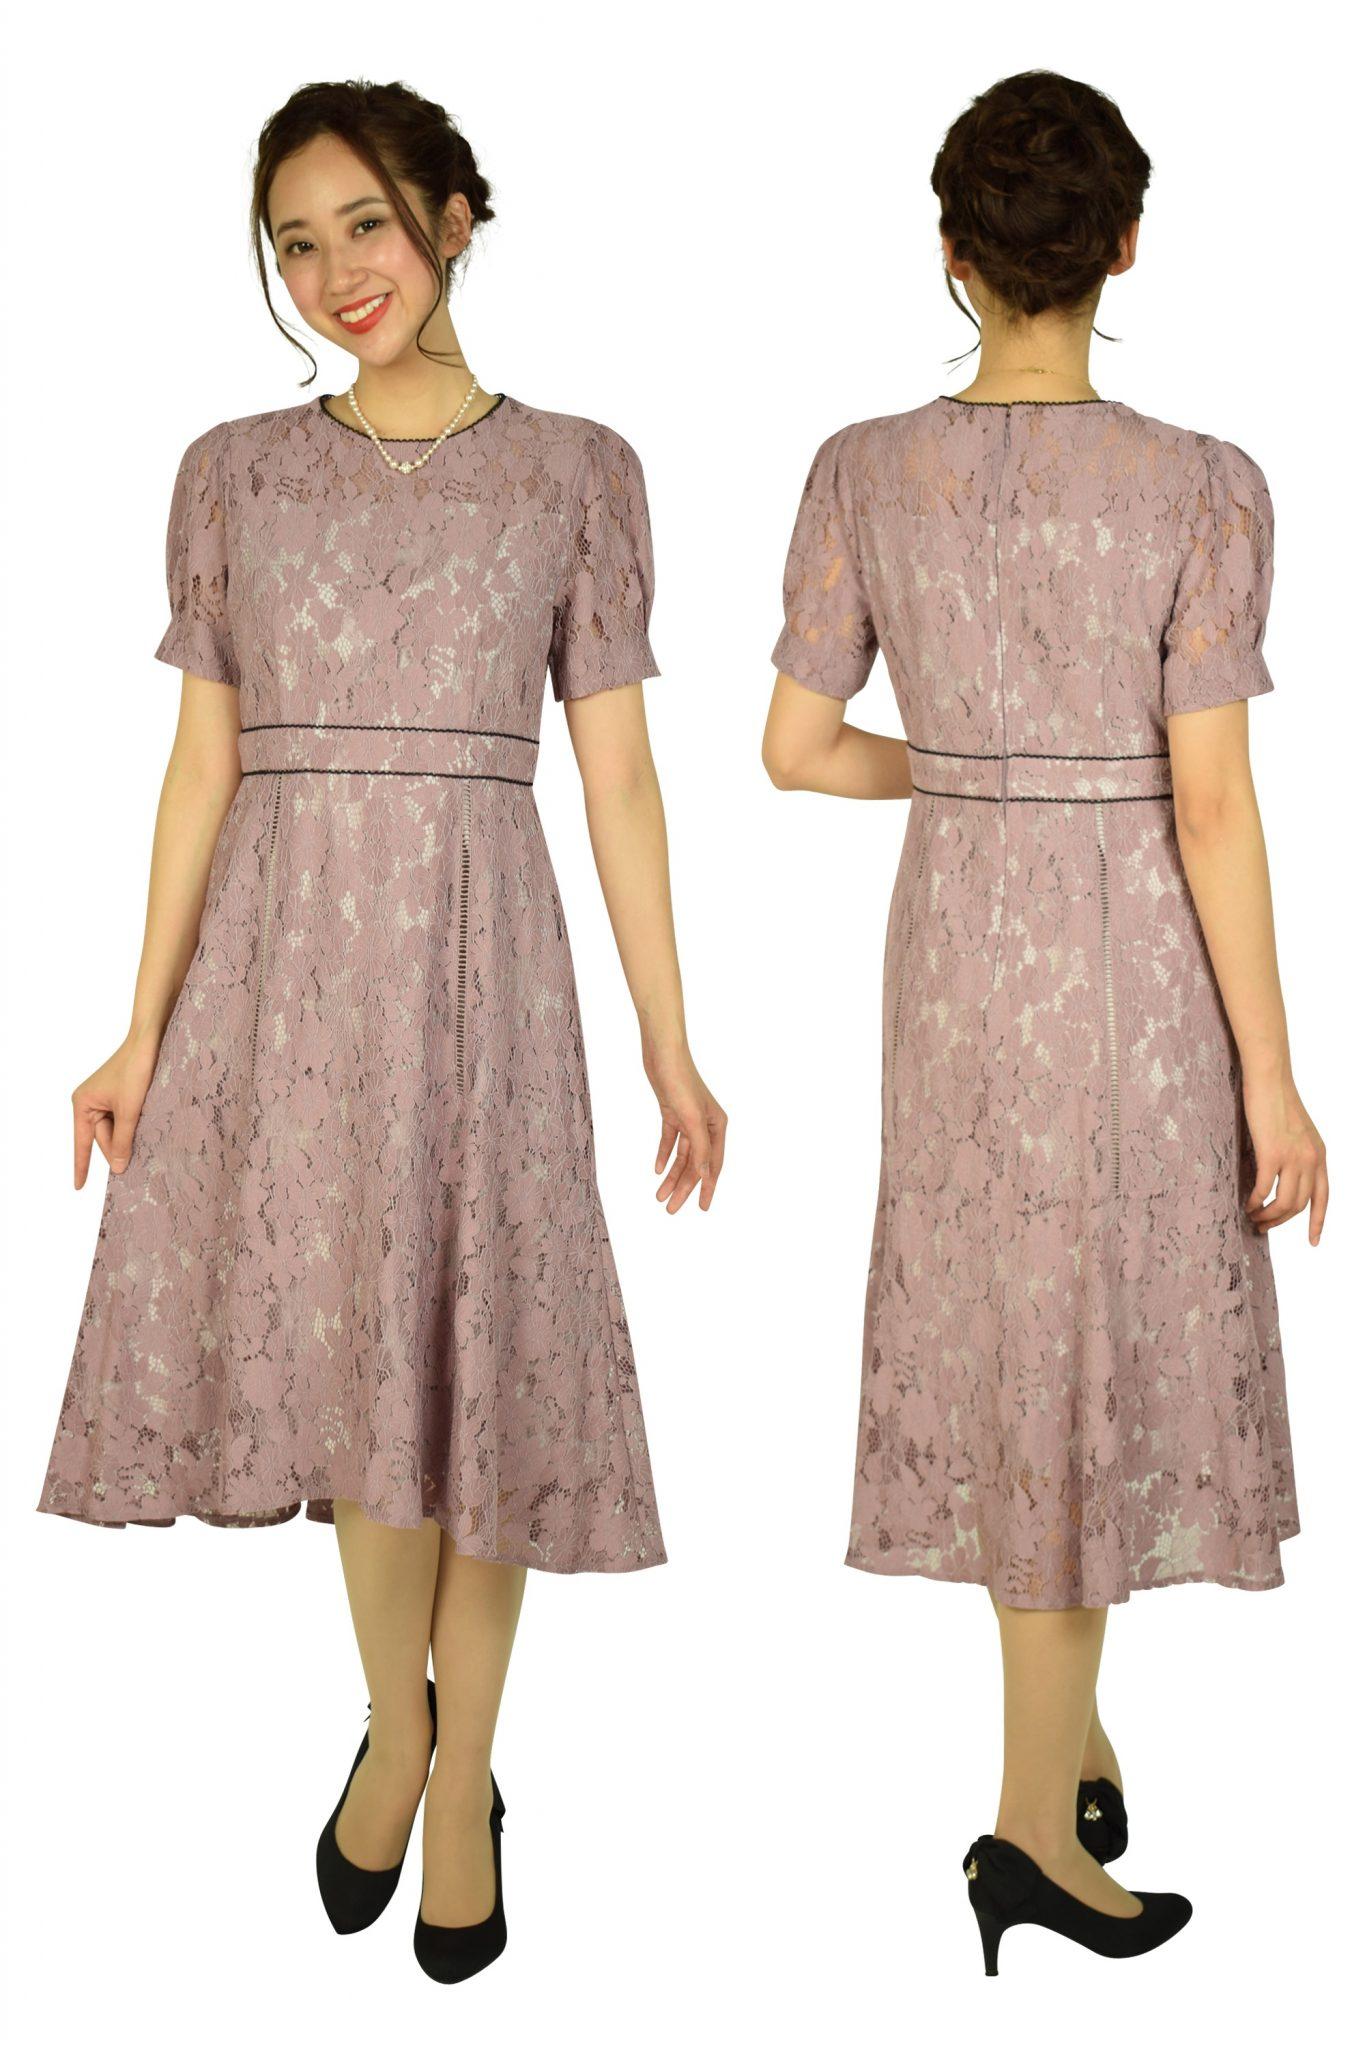 Je superパフスリーブレースピンクドレス